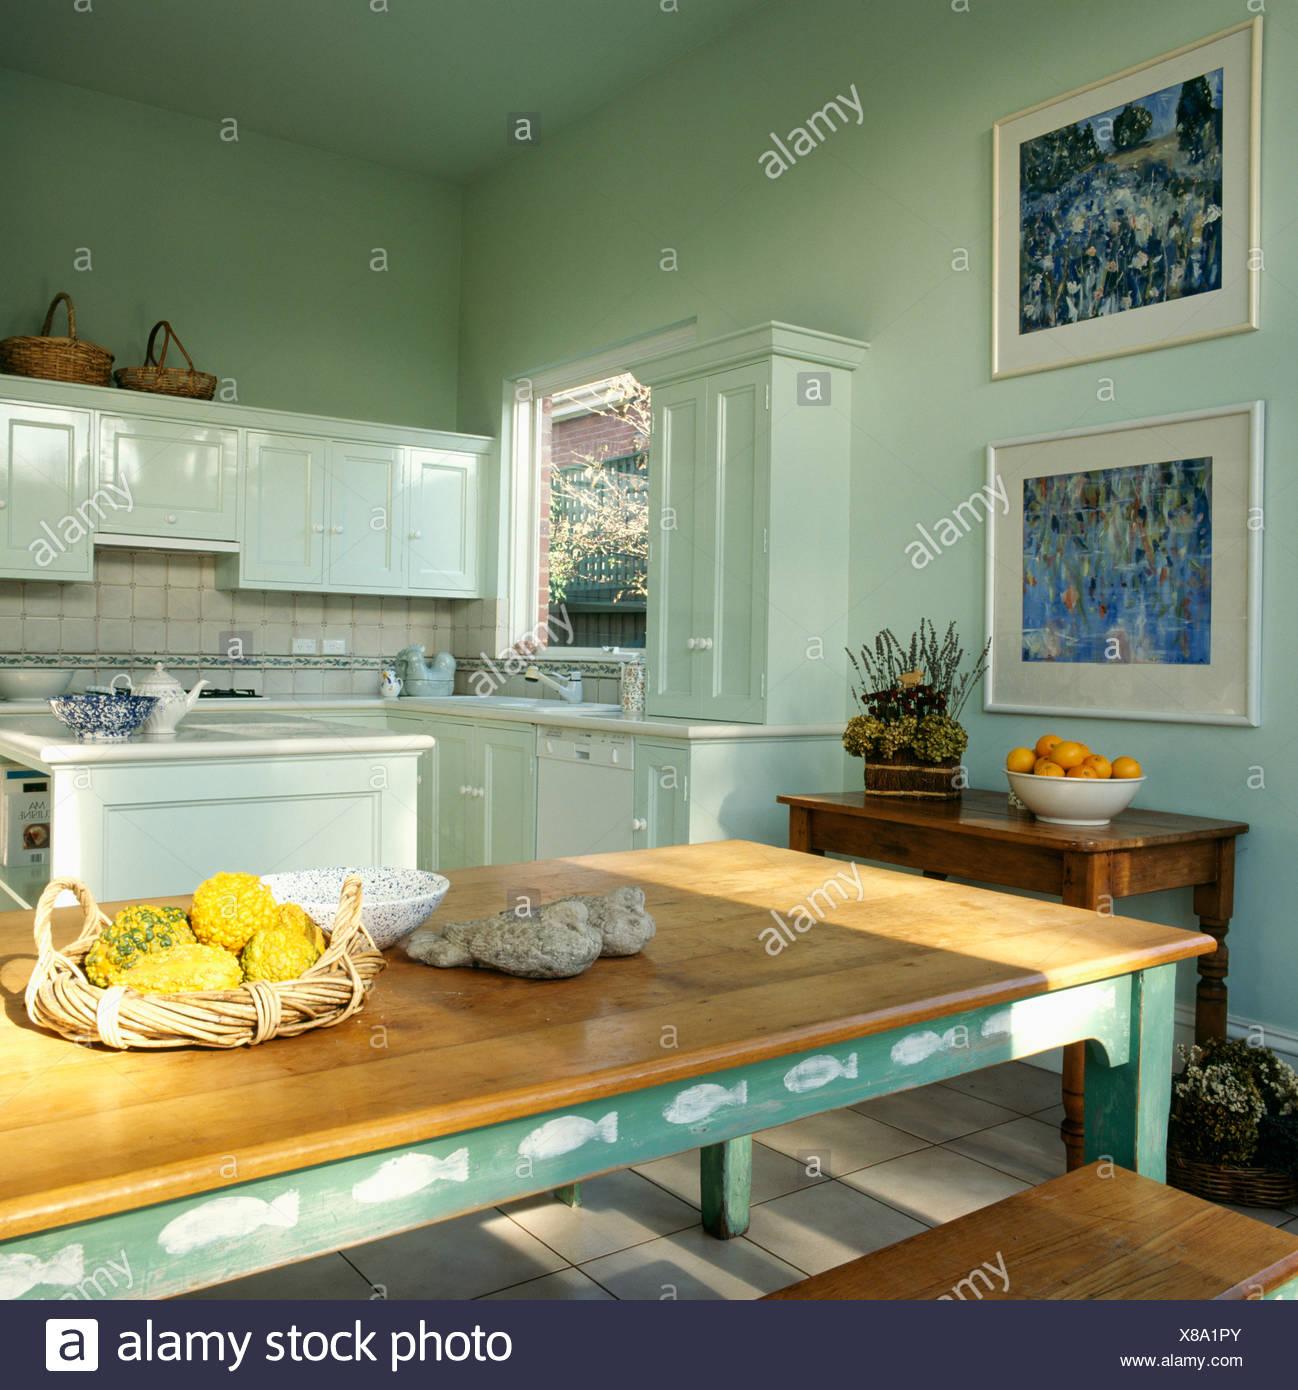 Kitchen Pastel Pastels Stockfotos & Kitchen Pastel Pastels Bilder ...